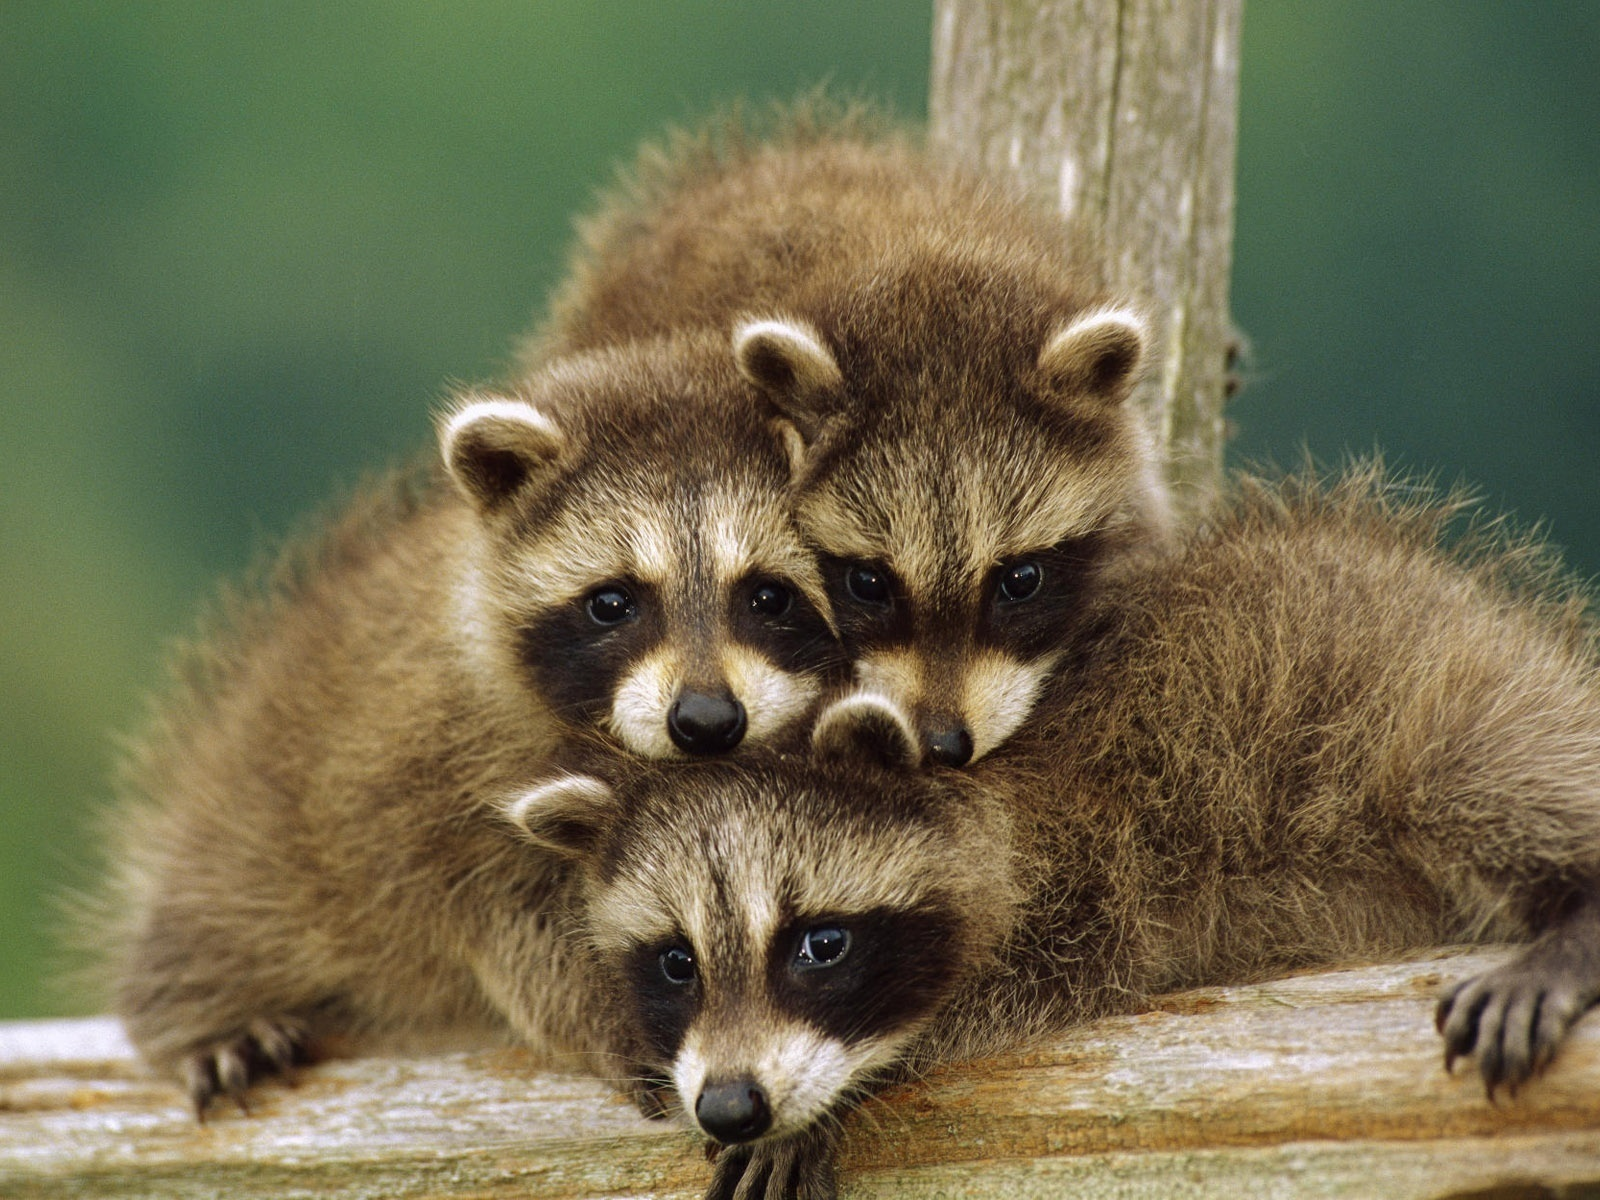 Cutest looking animals